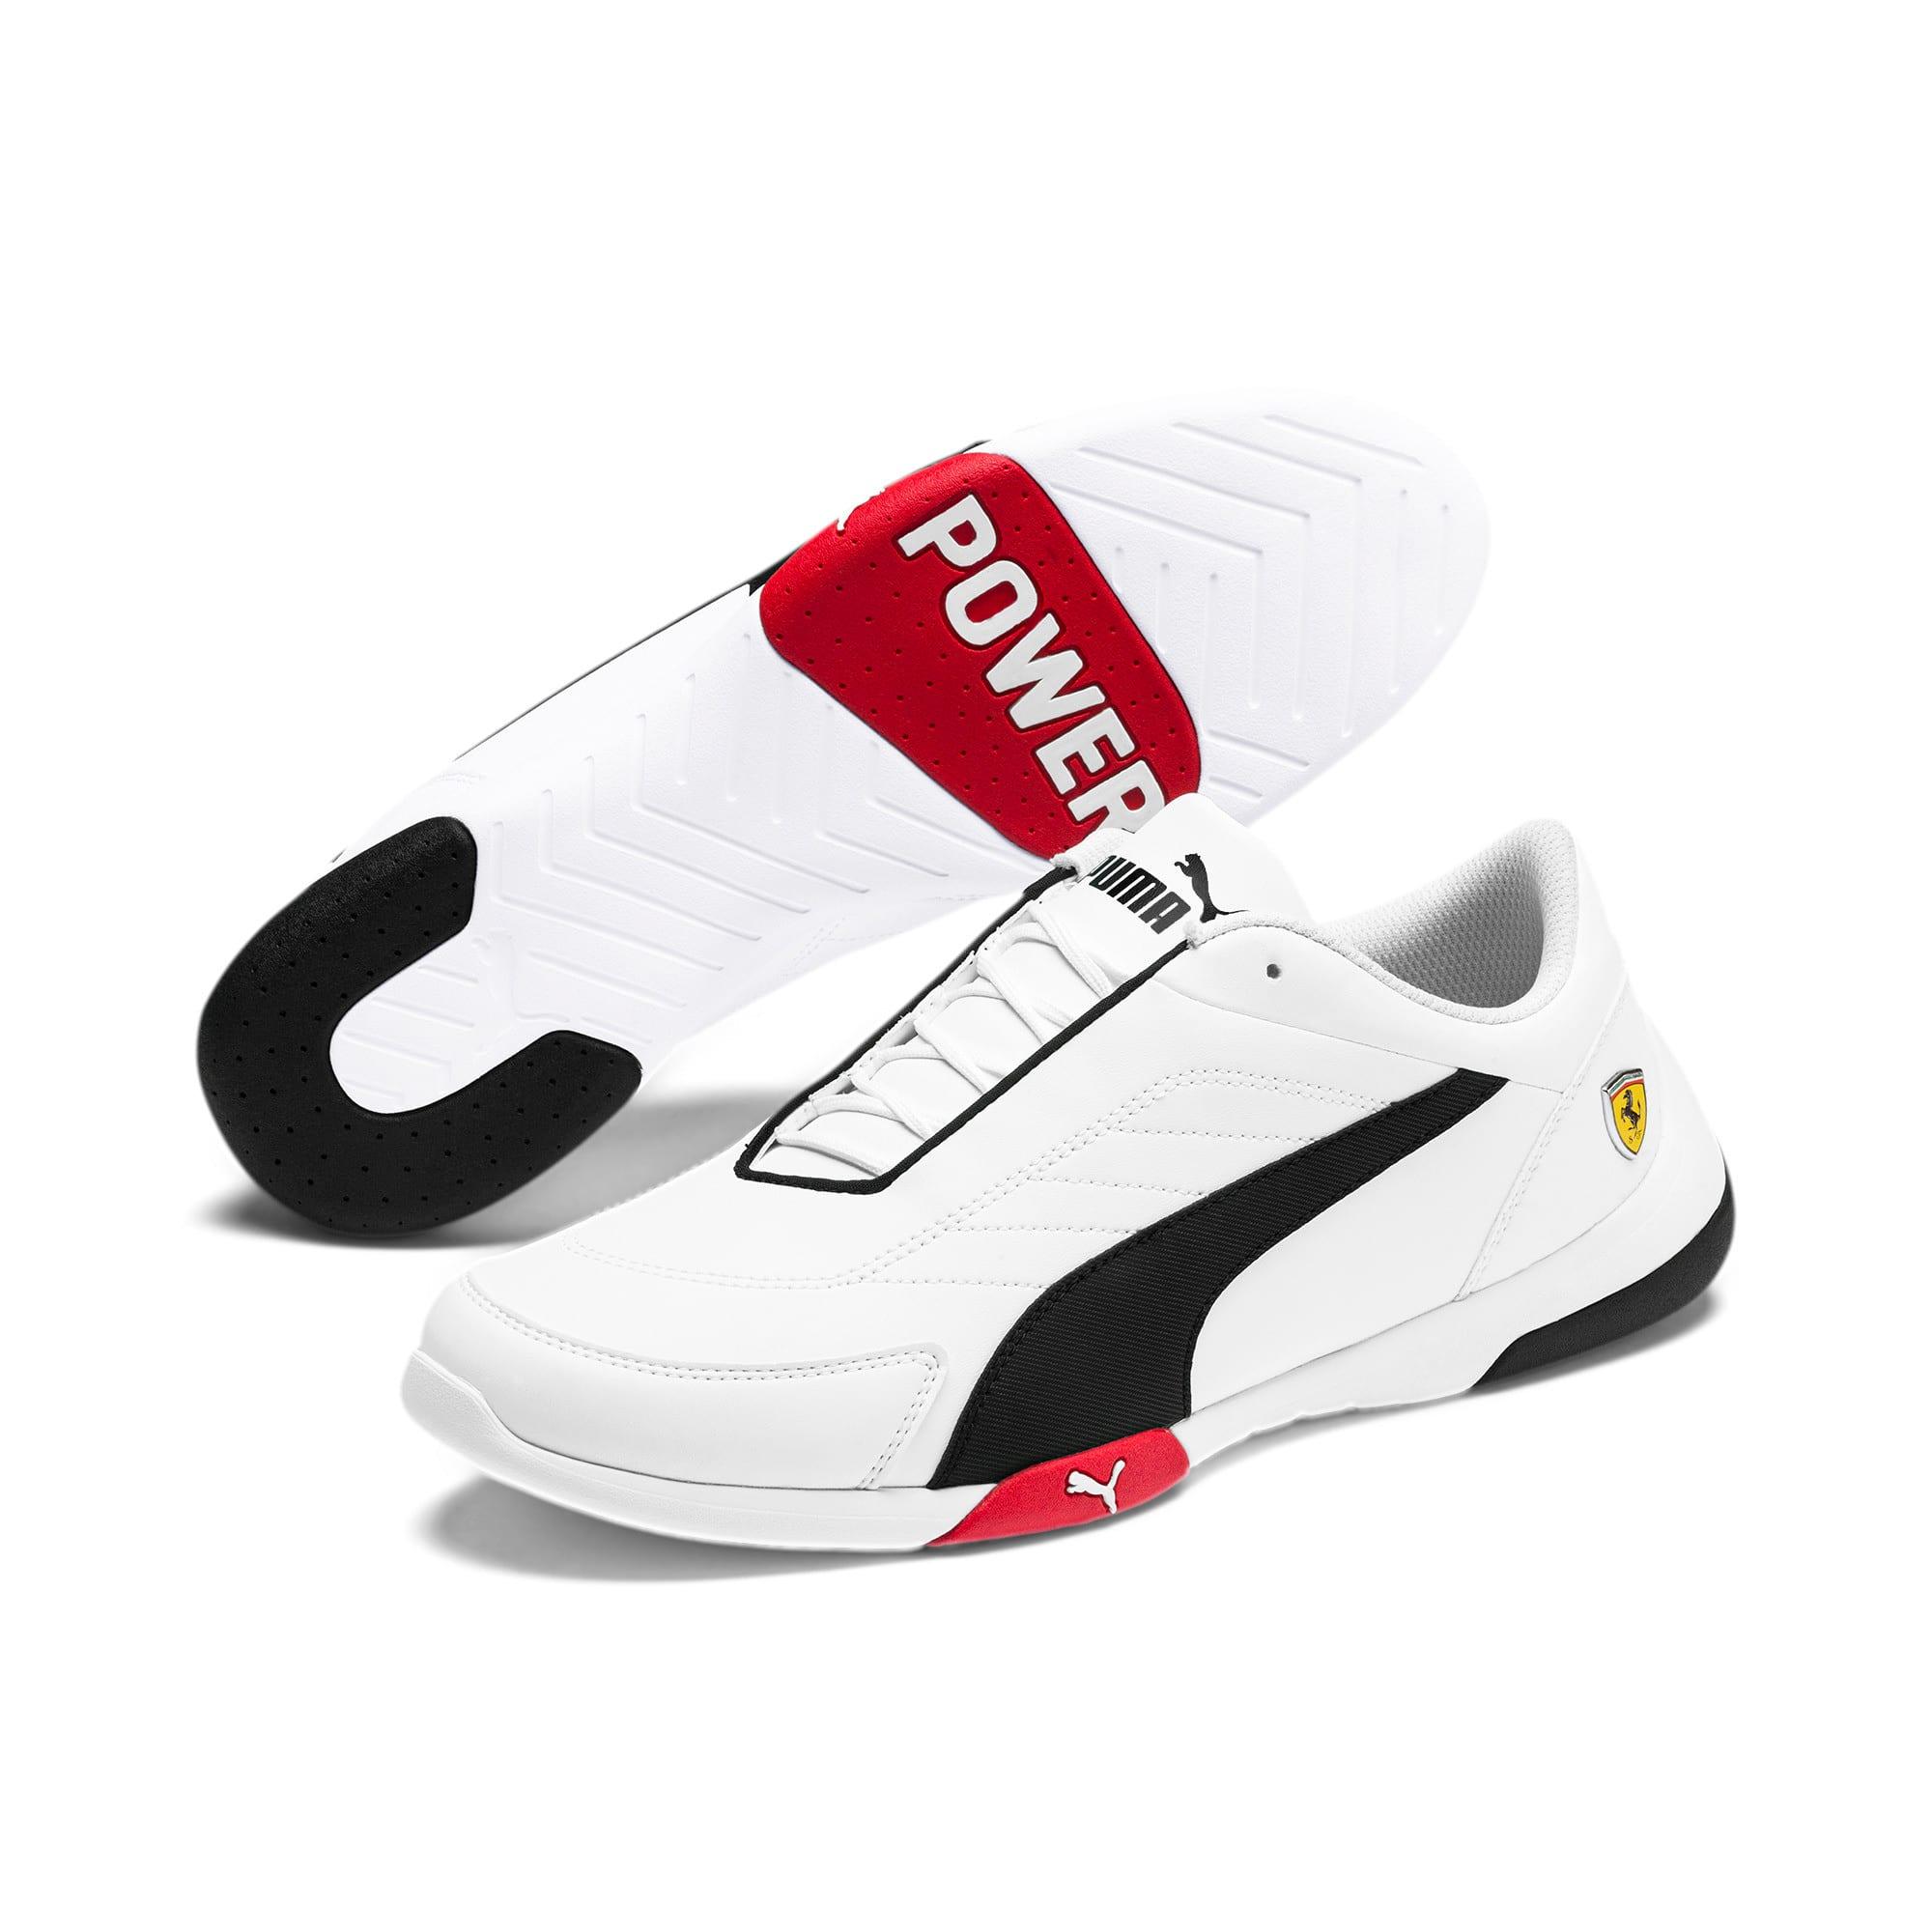 Thumbnail 4 of Scuderia Ferrari Kart Cat III Shoes, White-Black-Rosso Corsa, medium